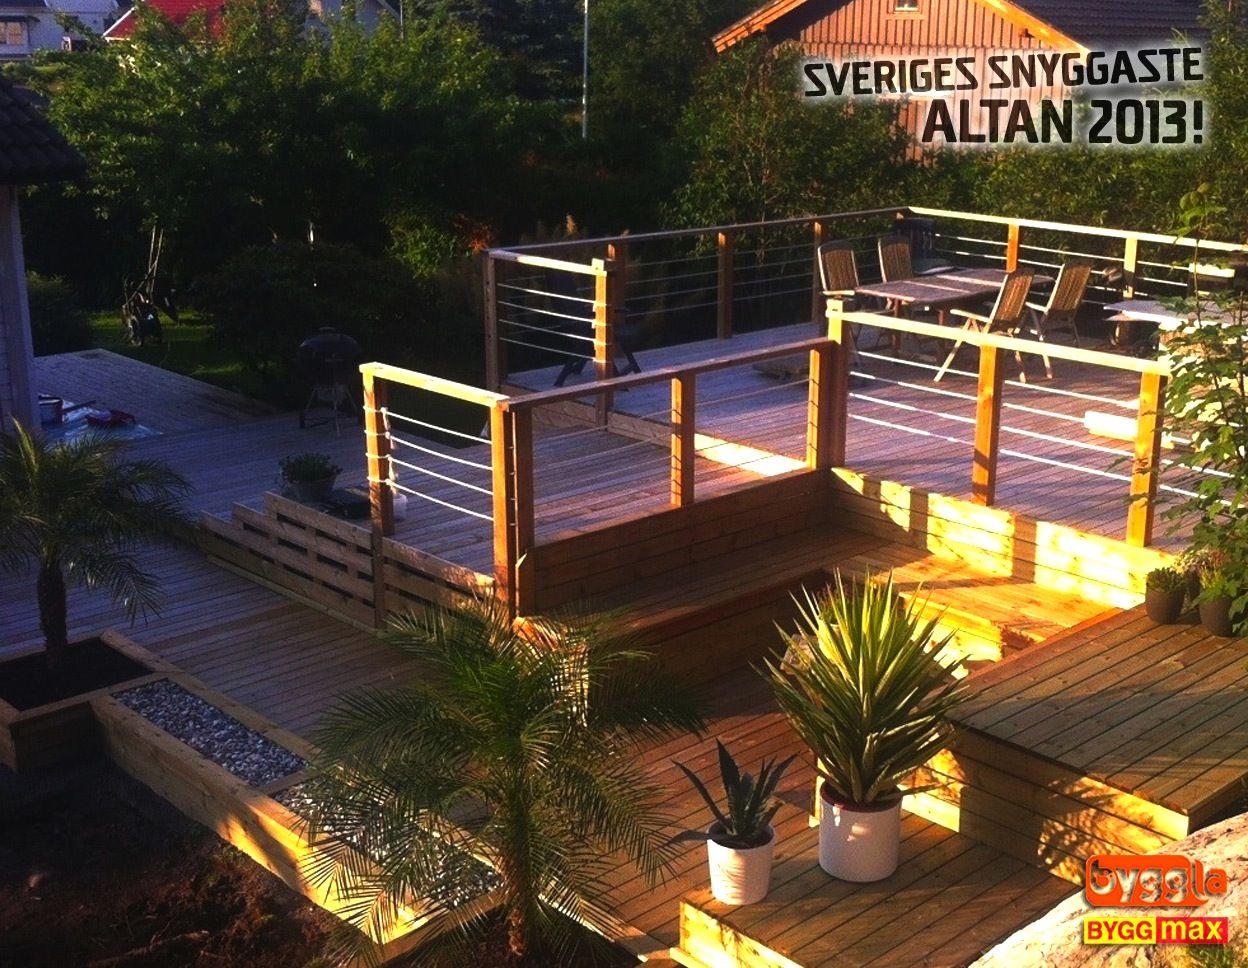 Vinnaren i byggtävlingen 'Sveriges Snyggaste Altan 2012' heter ...